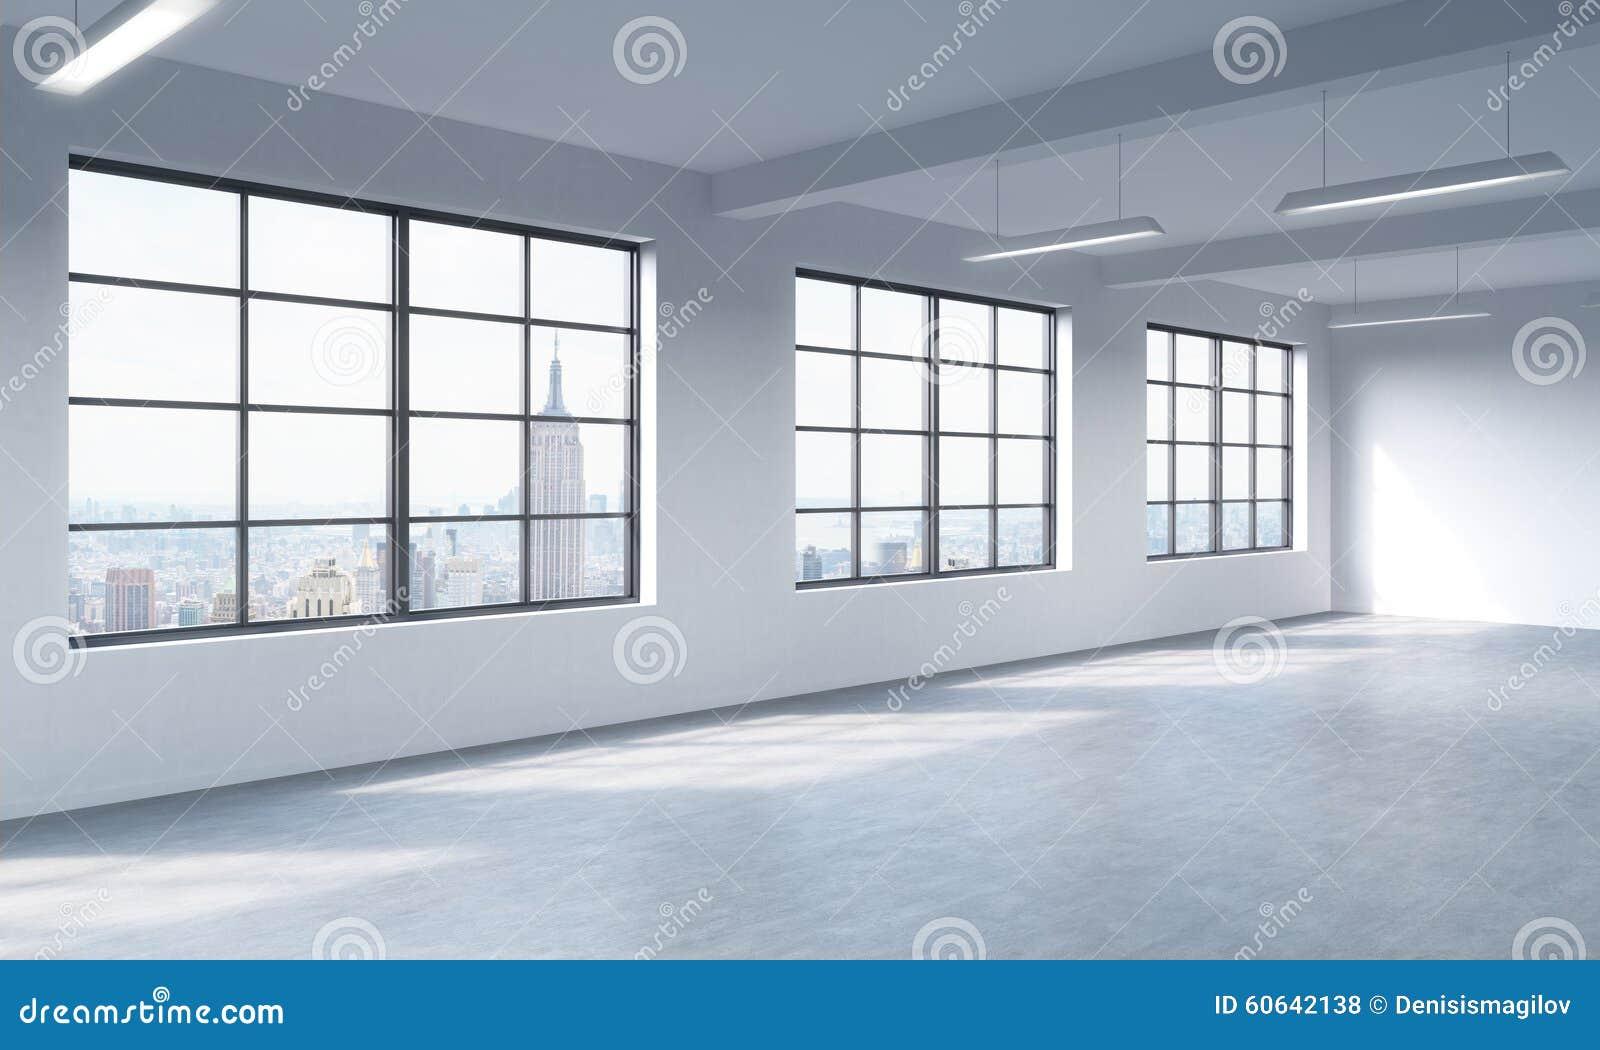 Fenster innenraum  Moderner Heller Sauberer Innenraum Eines Dachbodenartoffenen ...